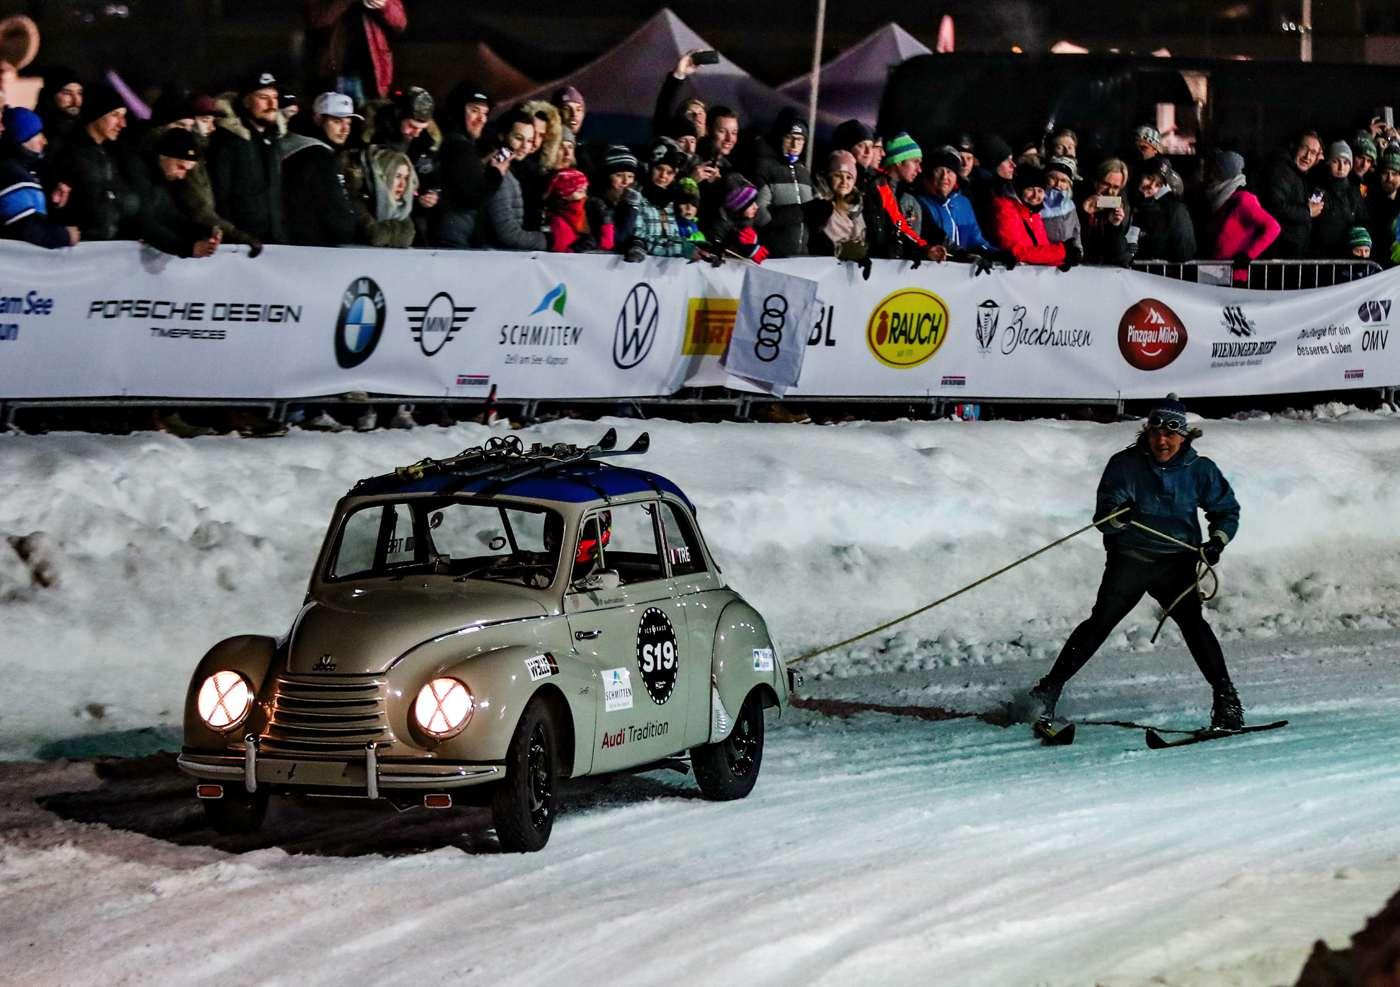 Audi Rennfahrer